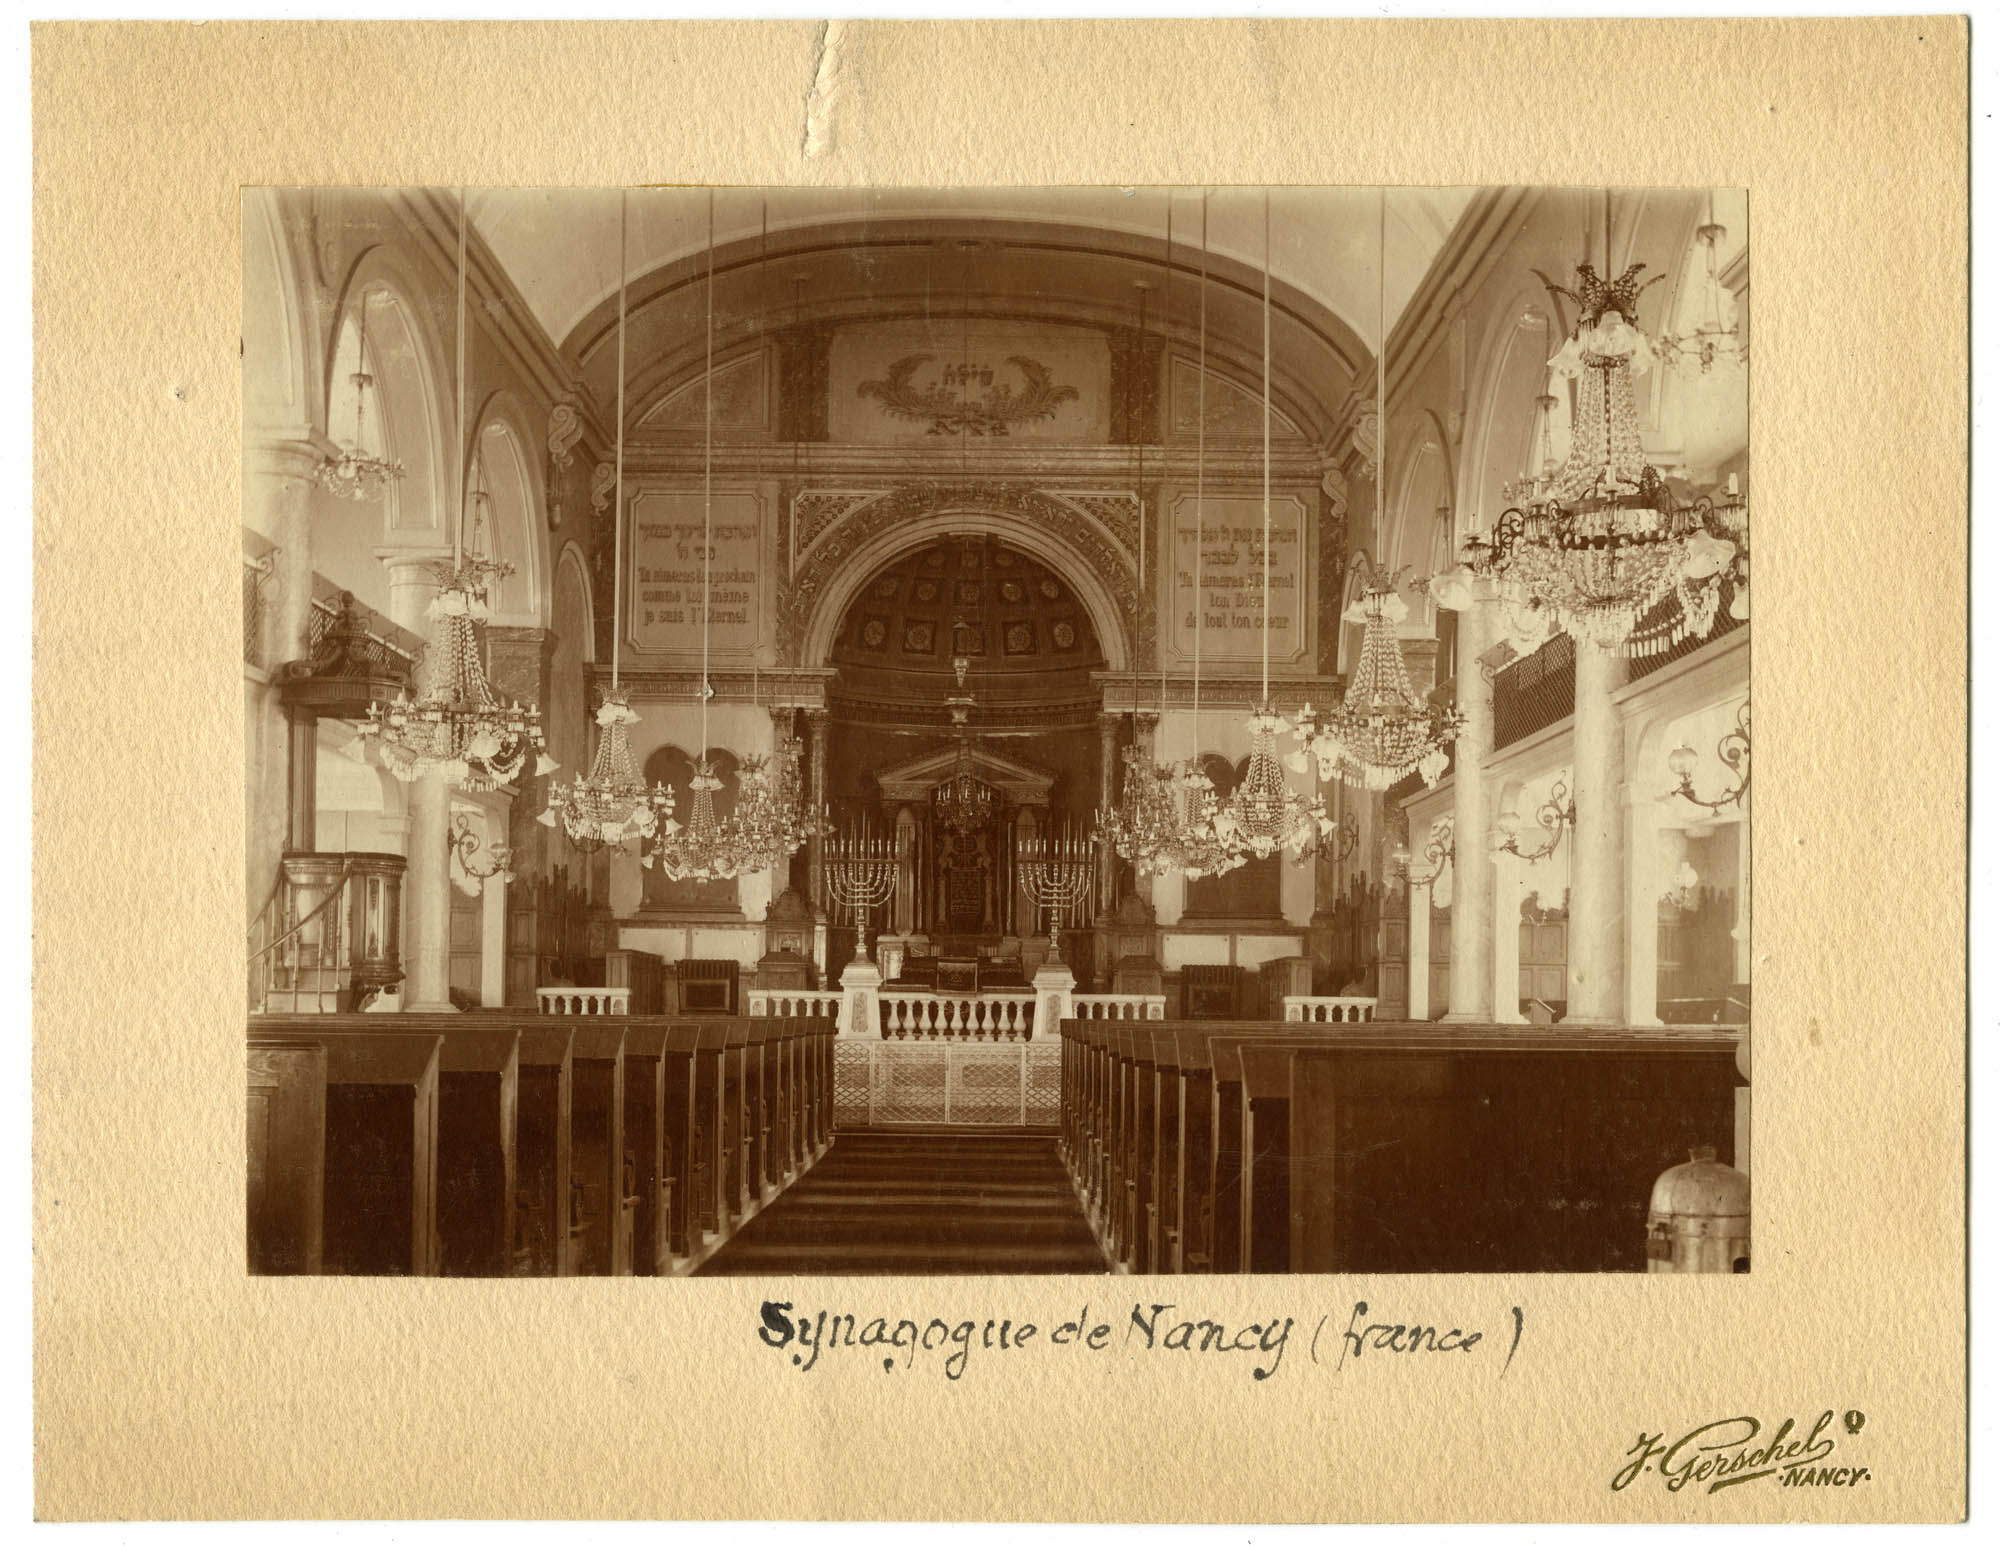 Synagogue de Nancy (France)